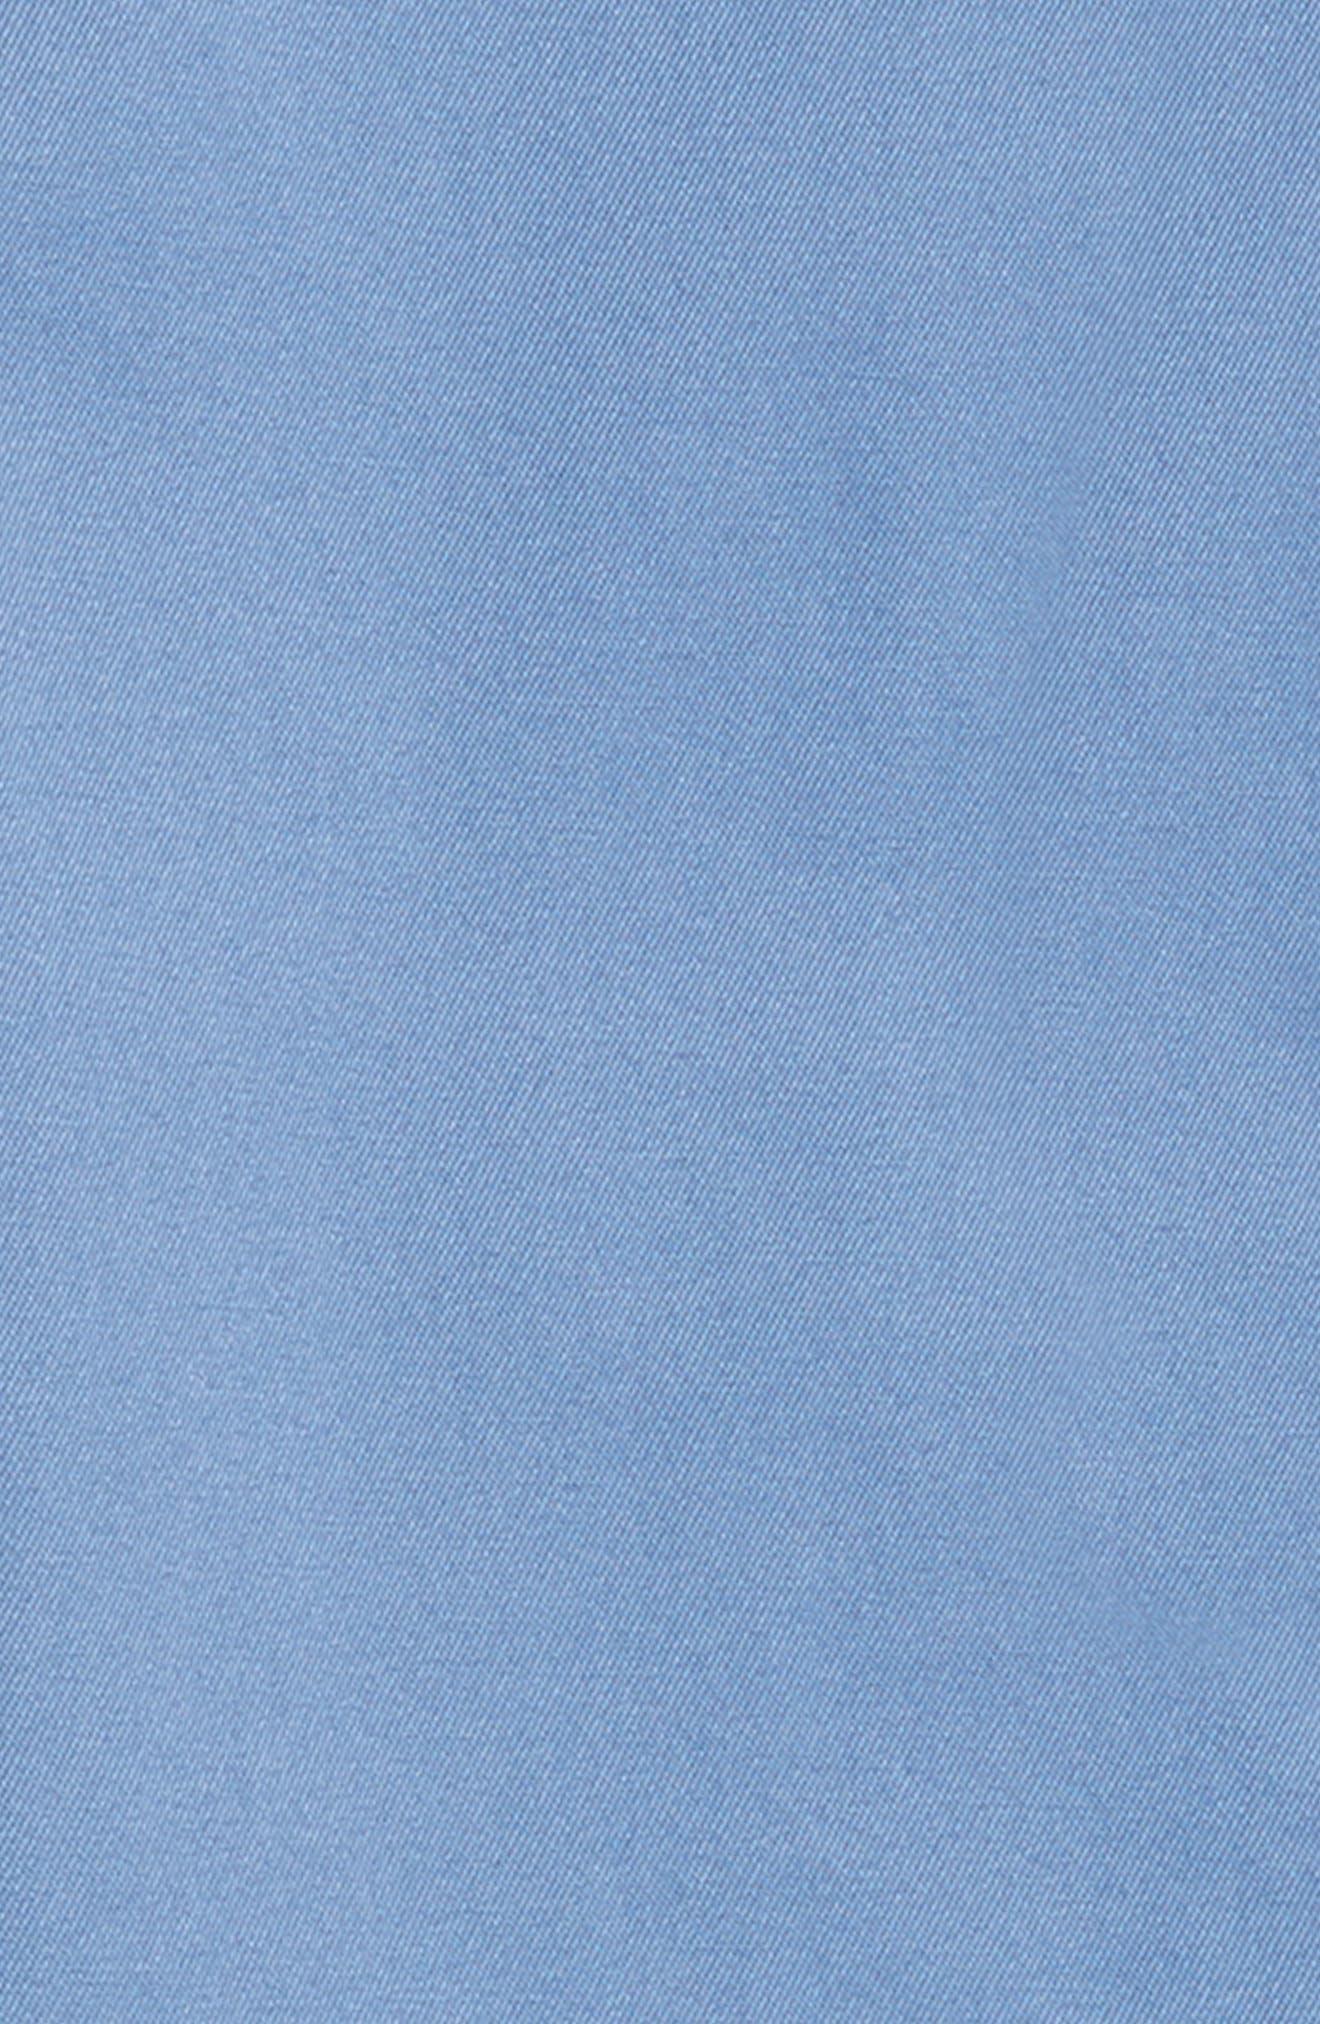 Breaker Pants,                             Alternate thumbnail 2, color,                             Dusk Blue